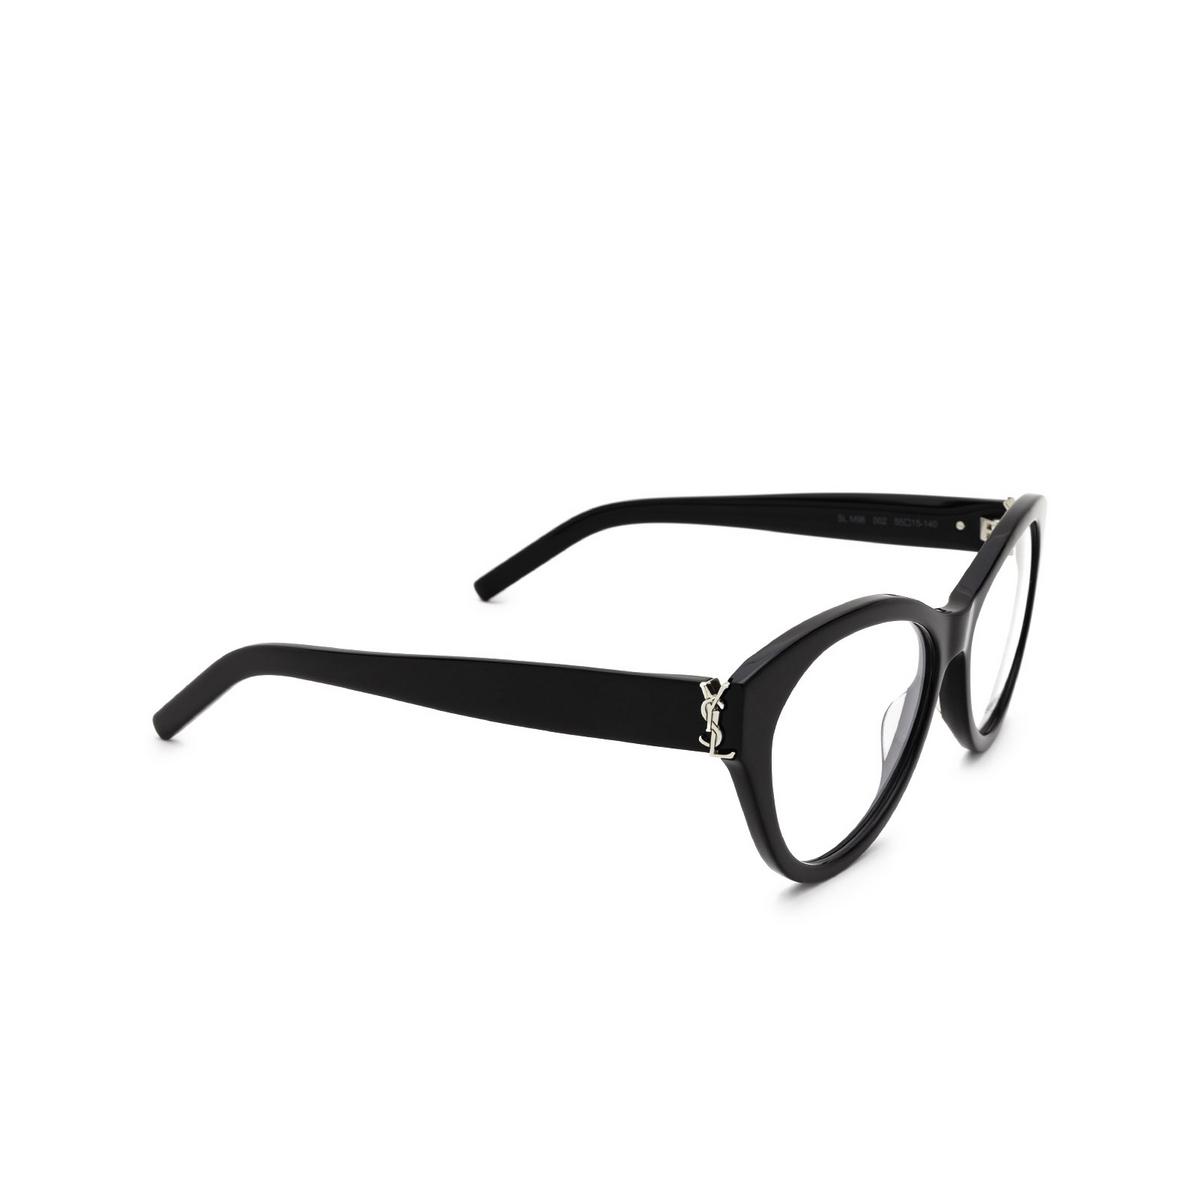 Saint Laurent® Cat-eye Eyeglasses: SL M96 color Black 002 - three-quarters view.